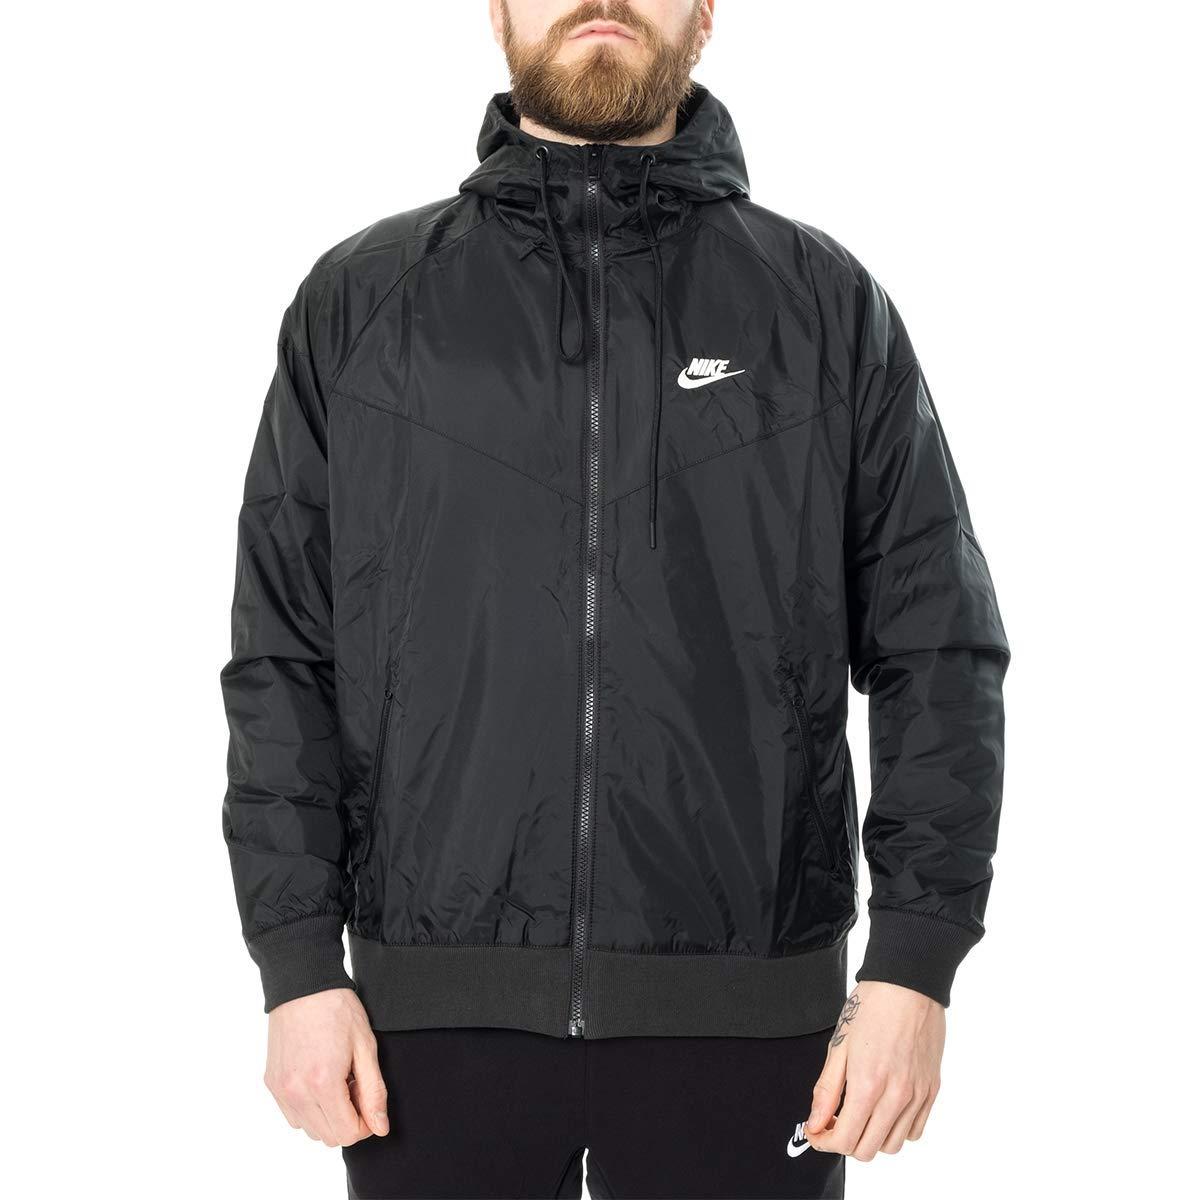 Nike Mens Sportswear 2019 Hooded Windrunner Jacket (Black/Black/Small) by Nike